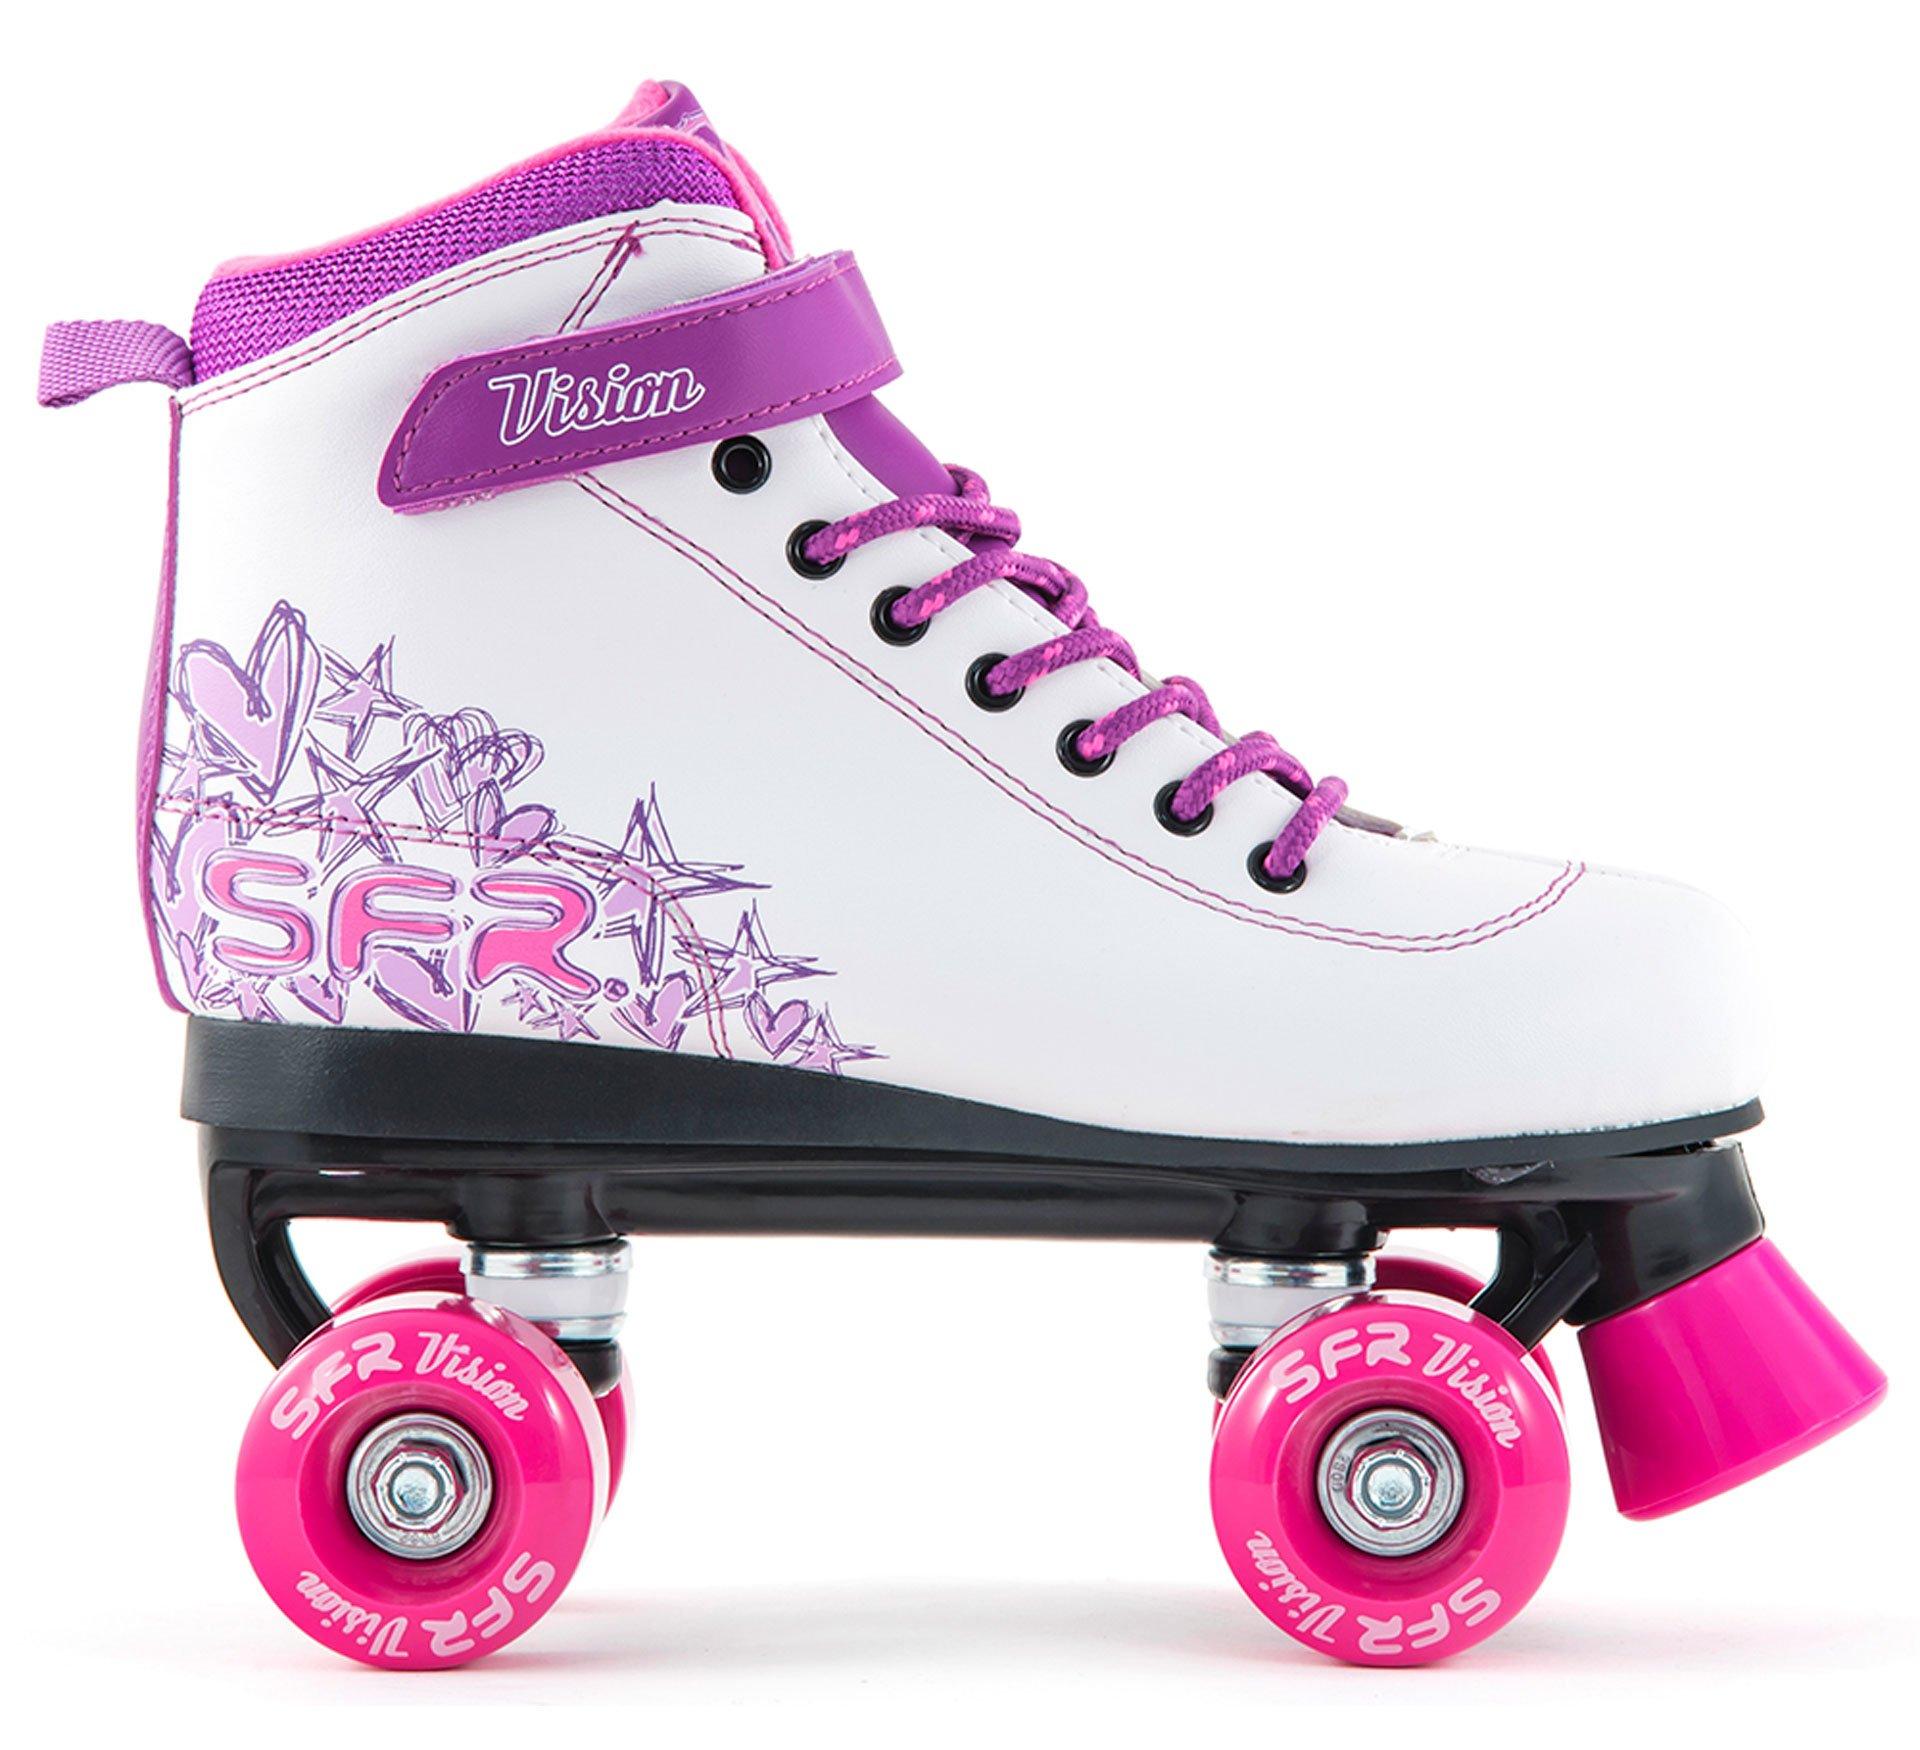 SFR Vision II Quad Skates